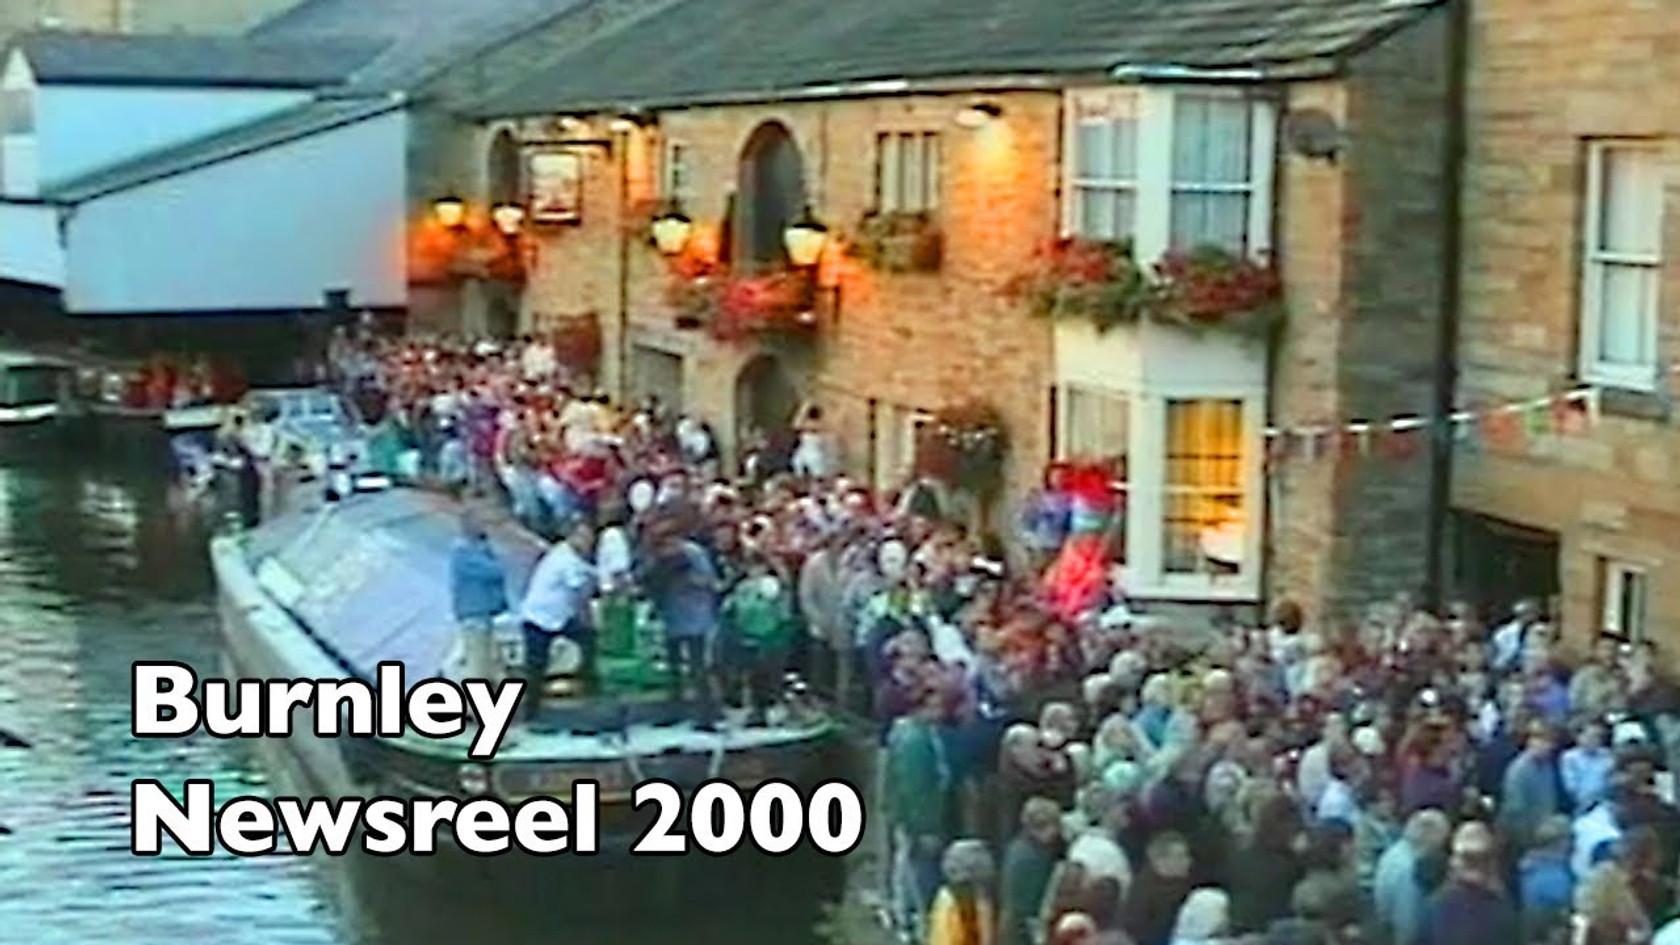 Burnley Newsreel 2000